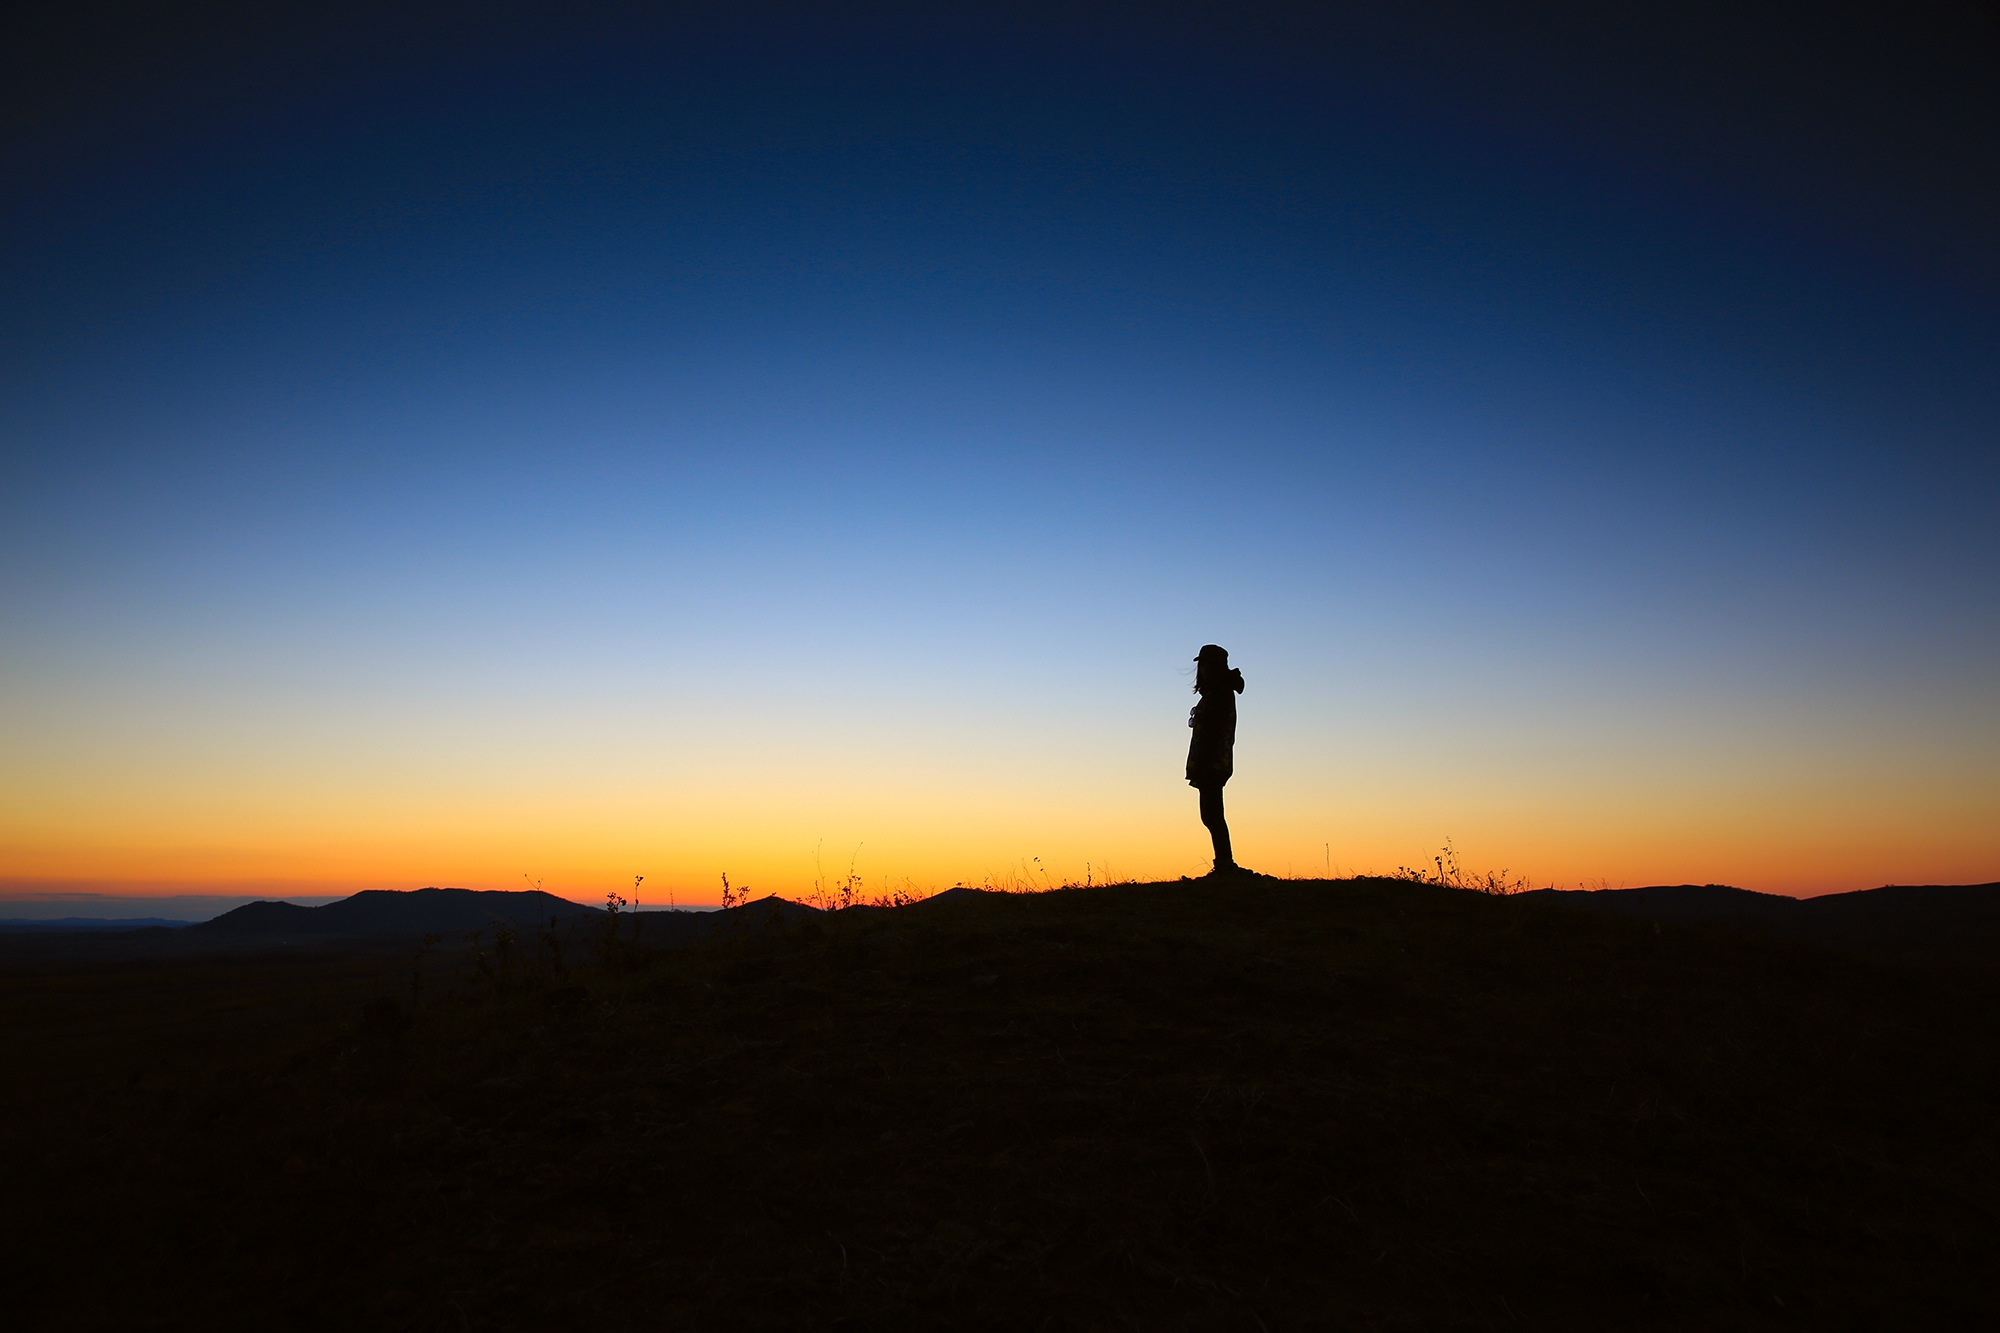 stock-image-shadow-sunset